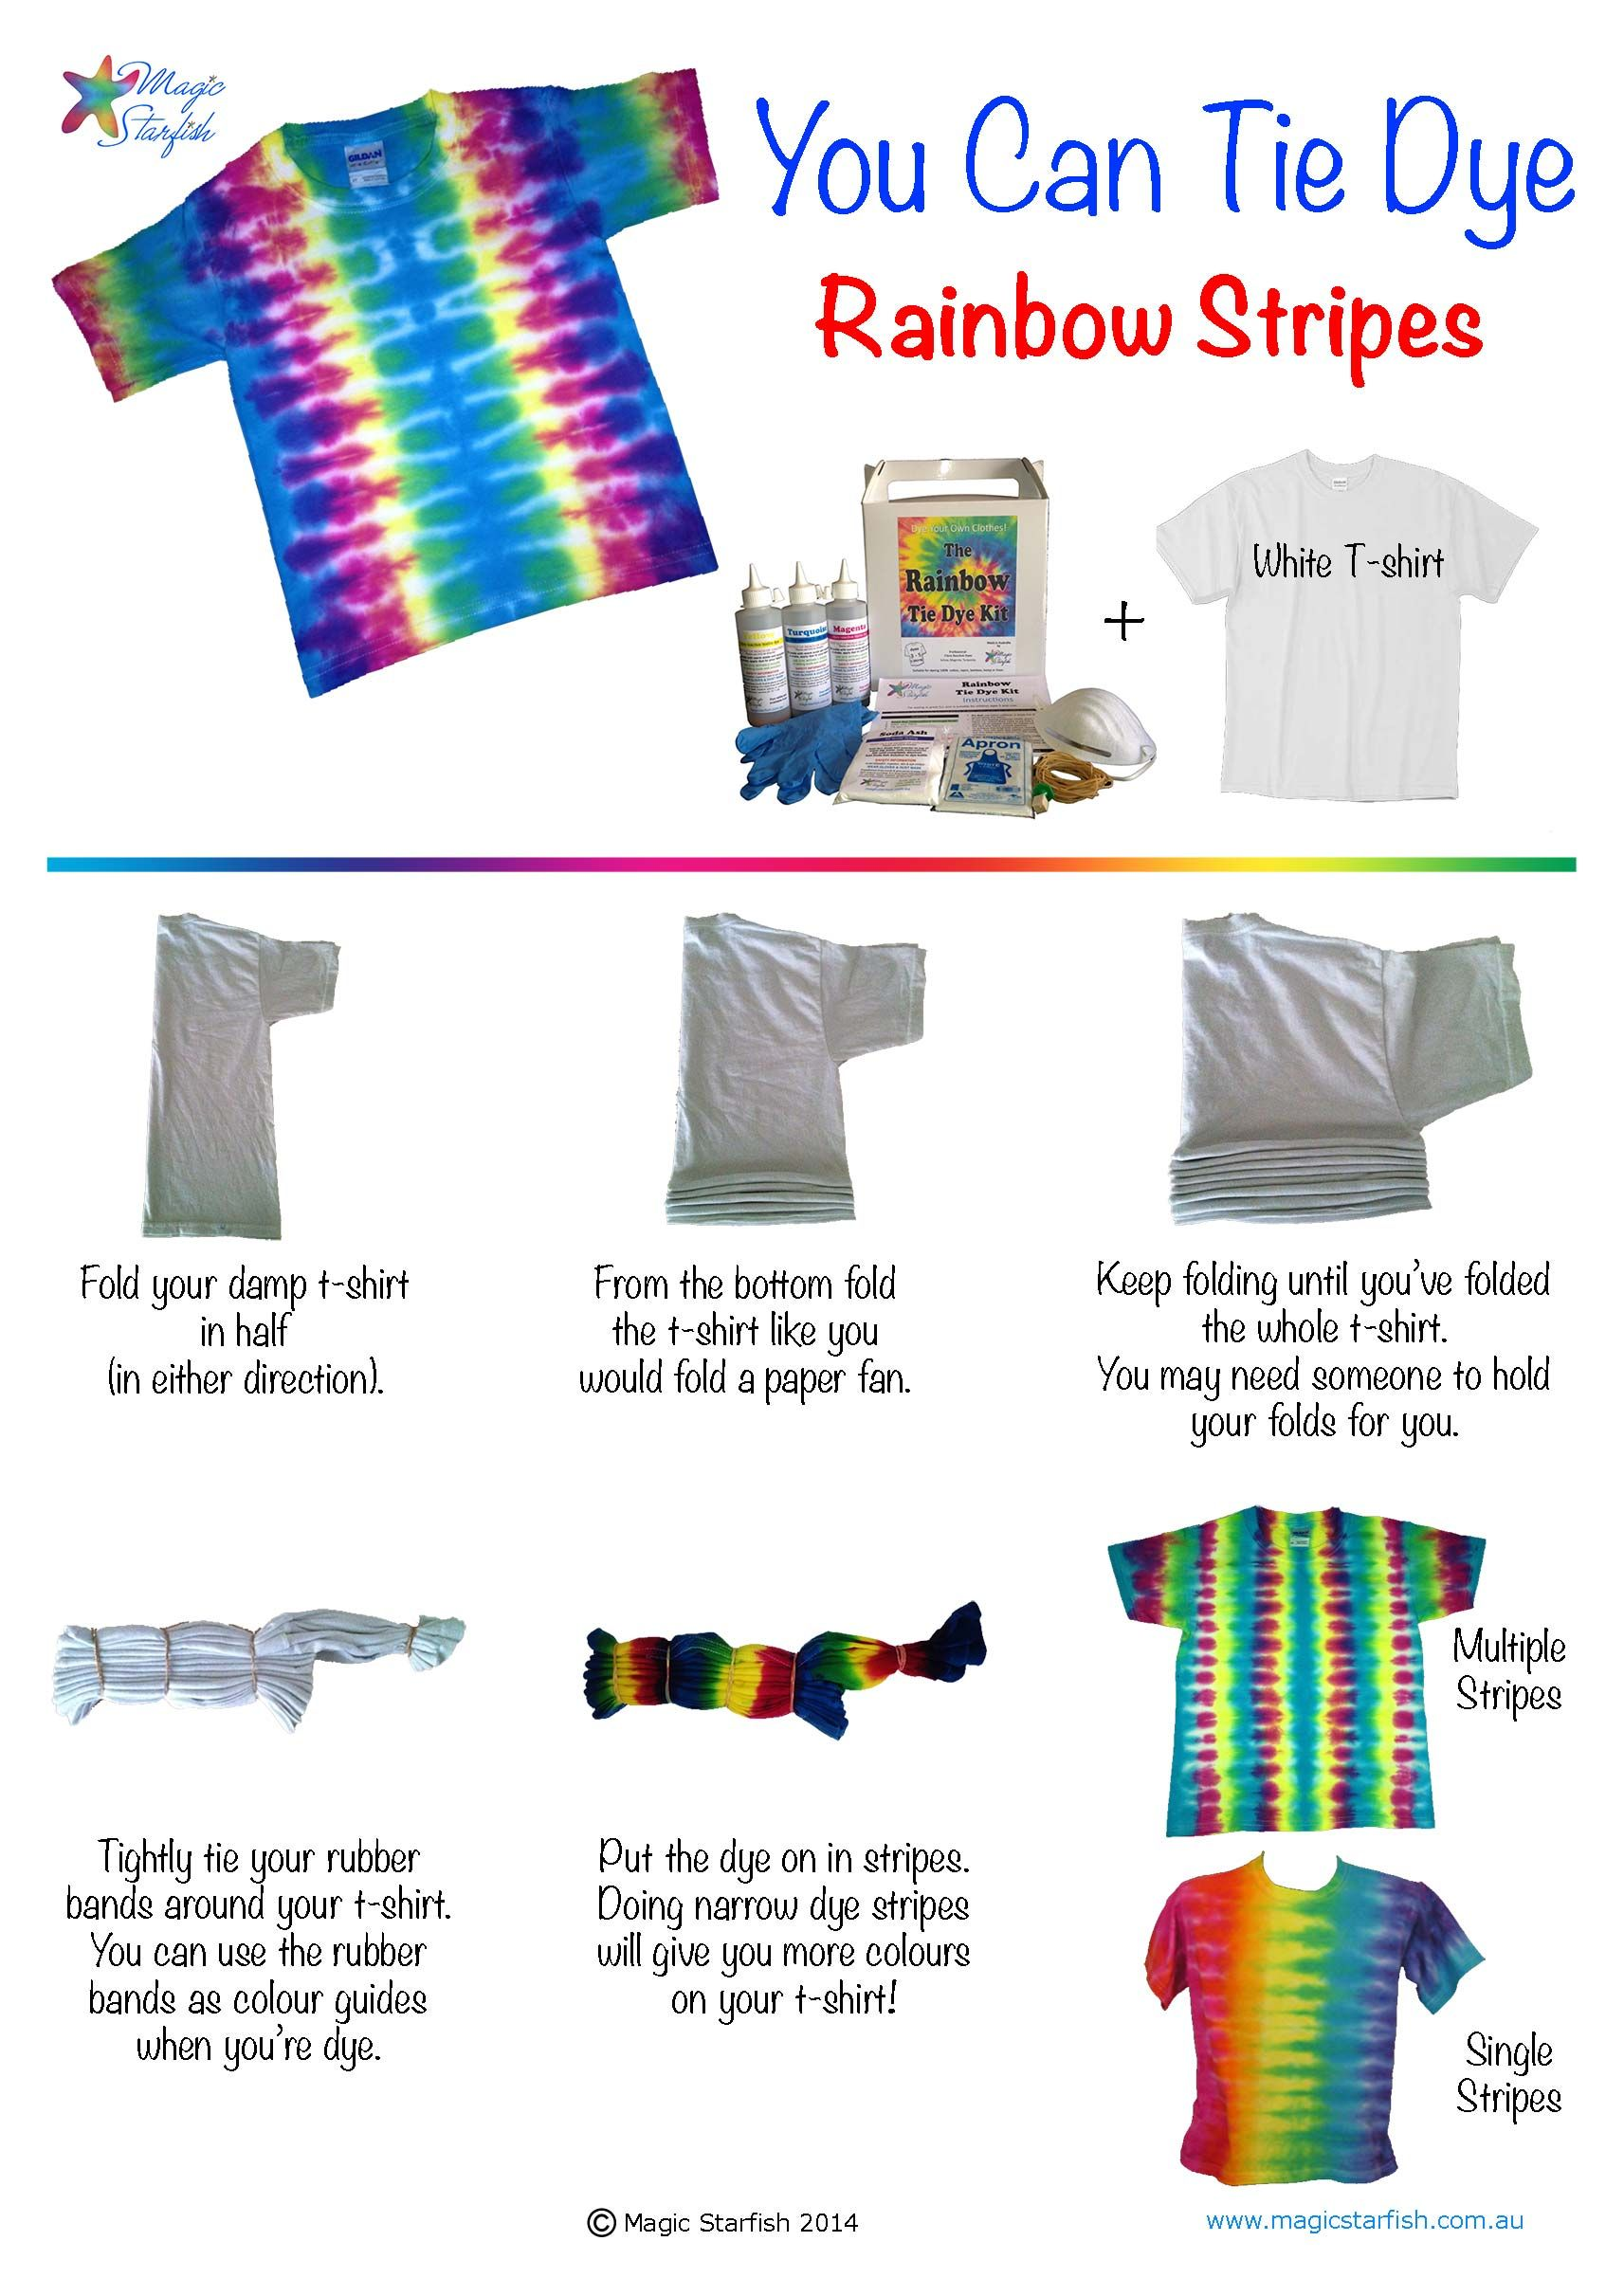 Magic Starfish Rainbow Stripes Instructions Jpg 1713 2422 Tie Dye Folding Techniques Tie Dye Kit Diy Tie Dye Shirts